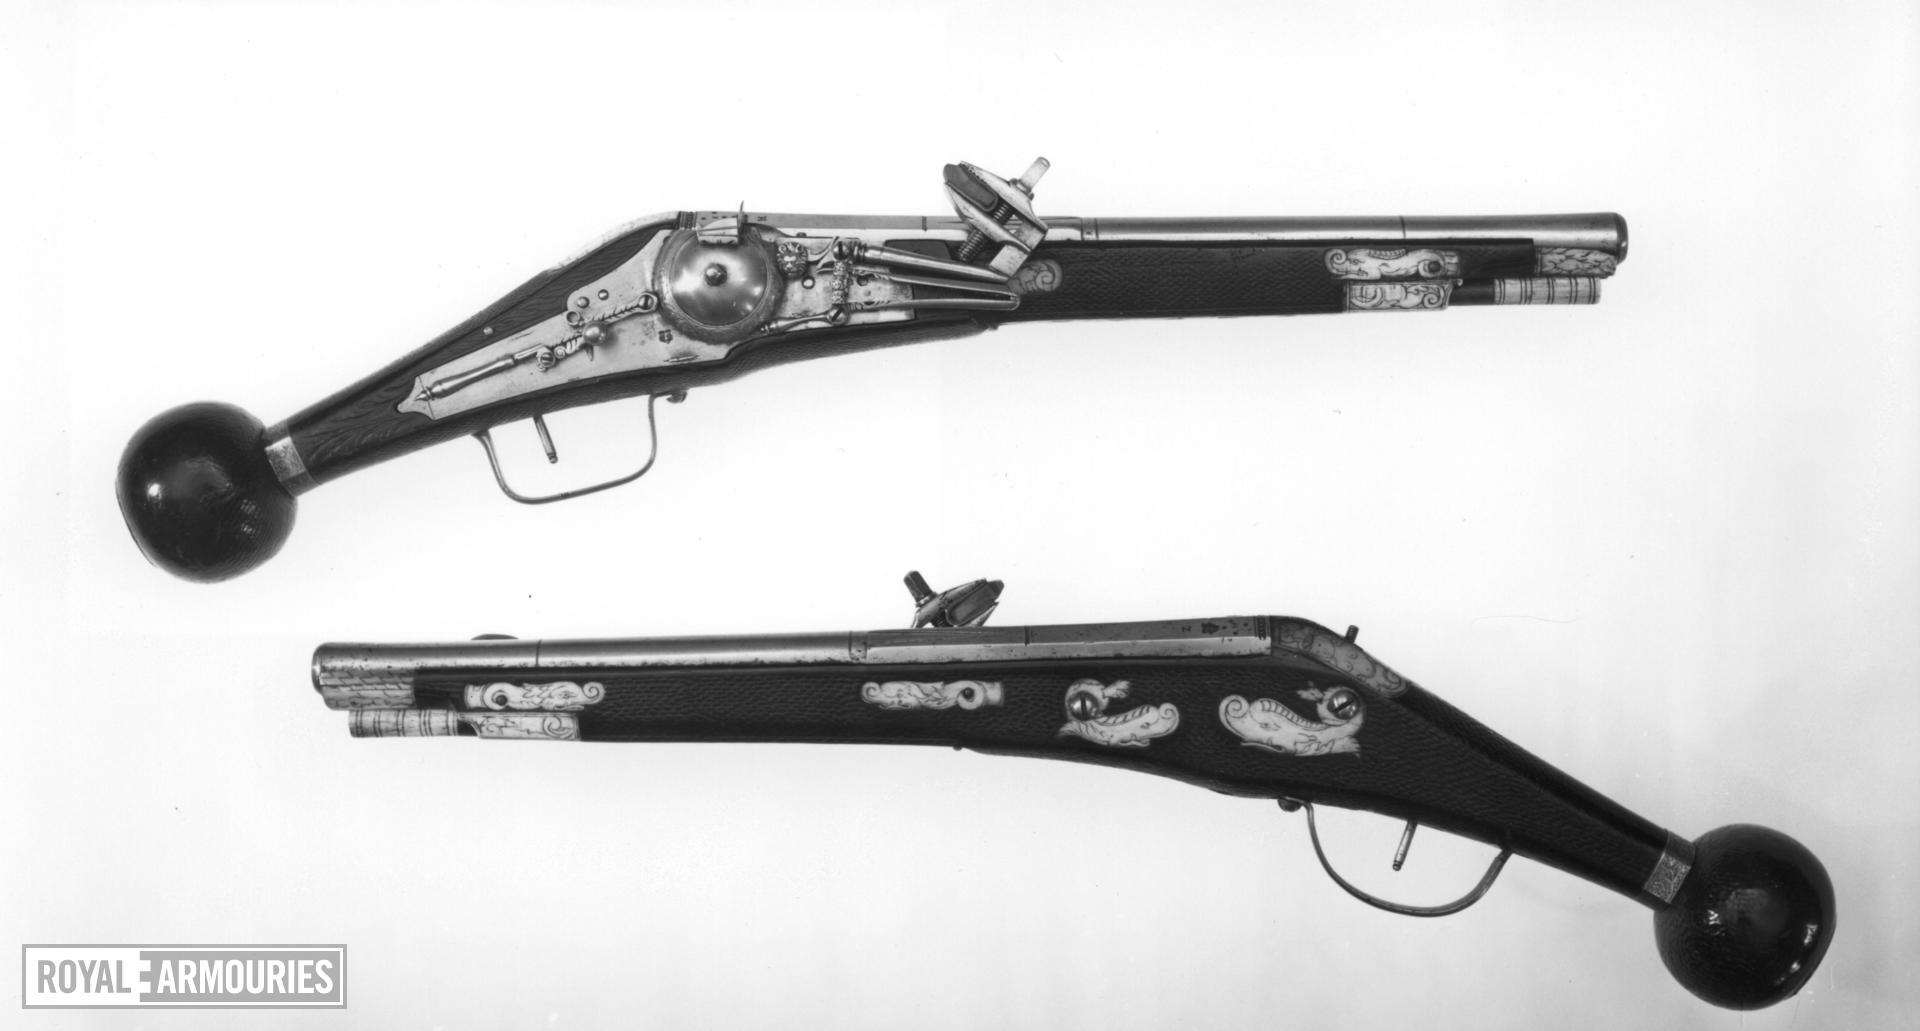 Wheellock holster pistol One of a pair of wheel lock holster pistols by Zacharias Herold